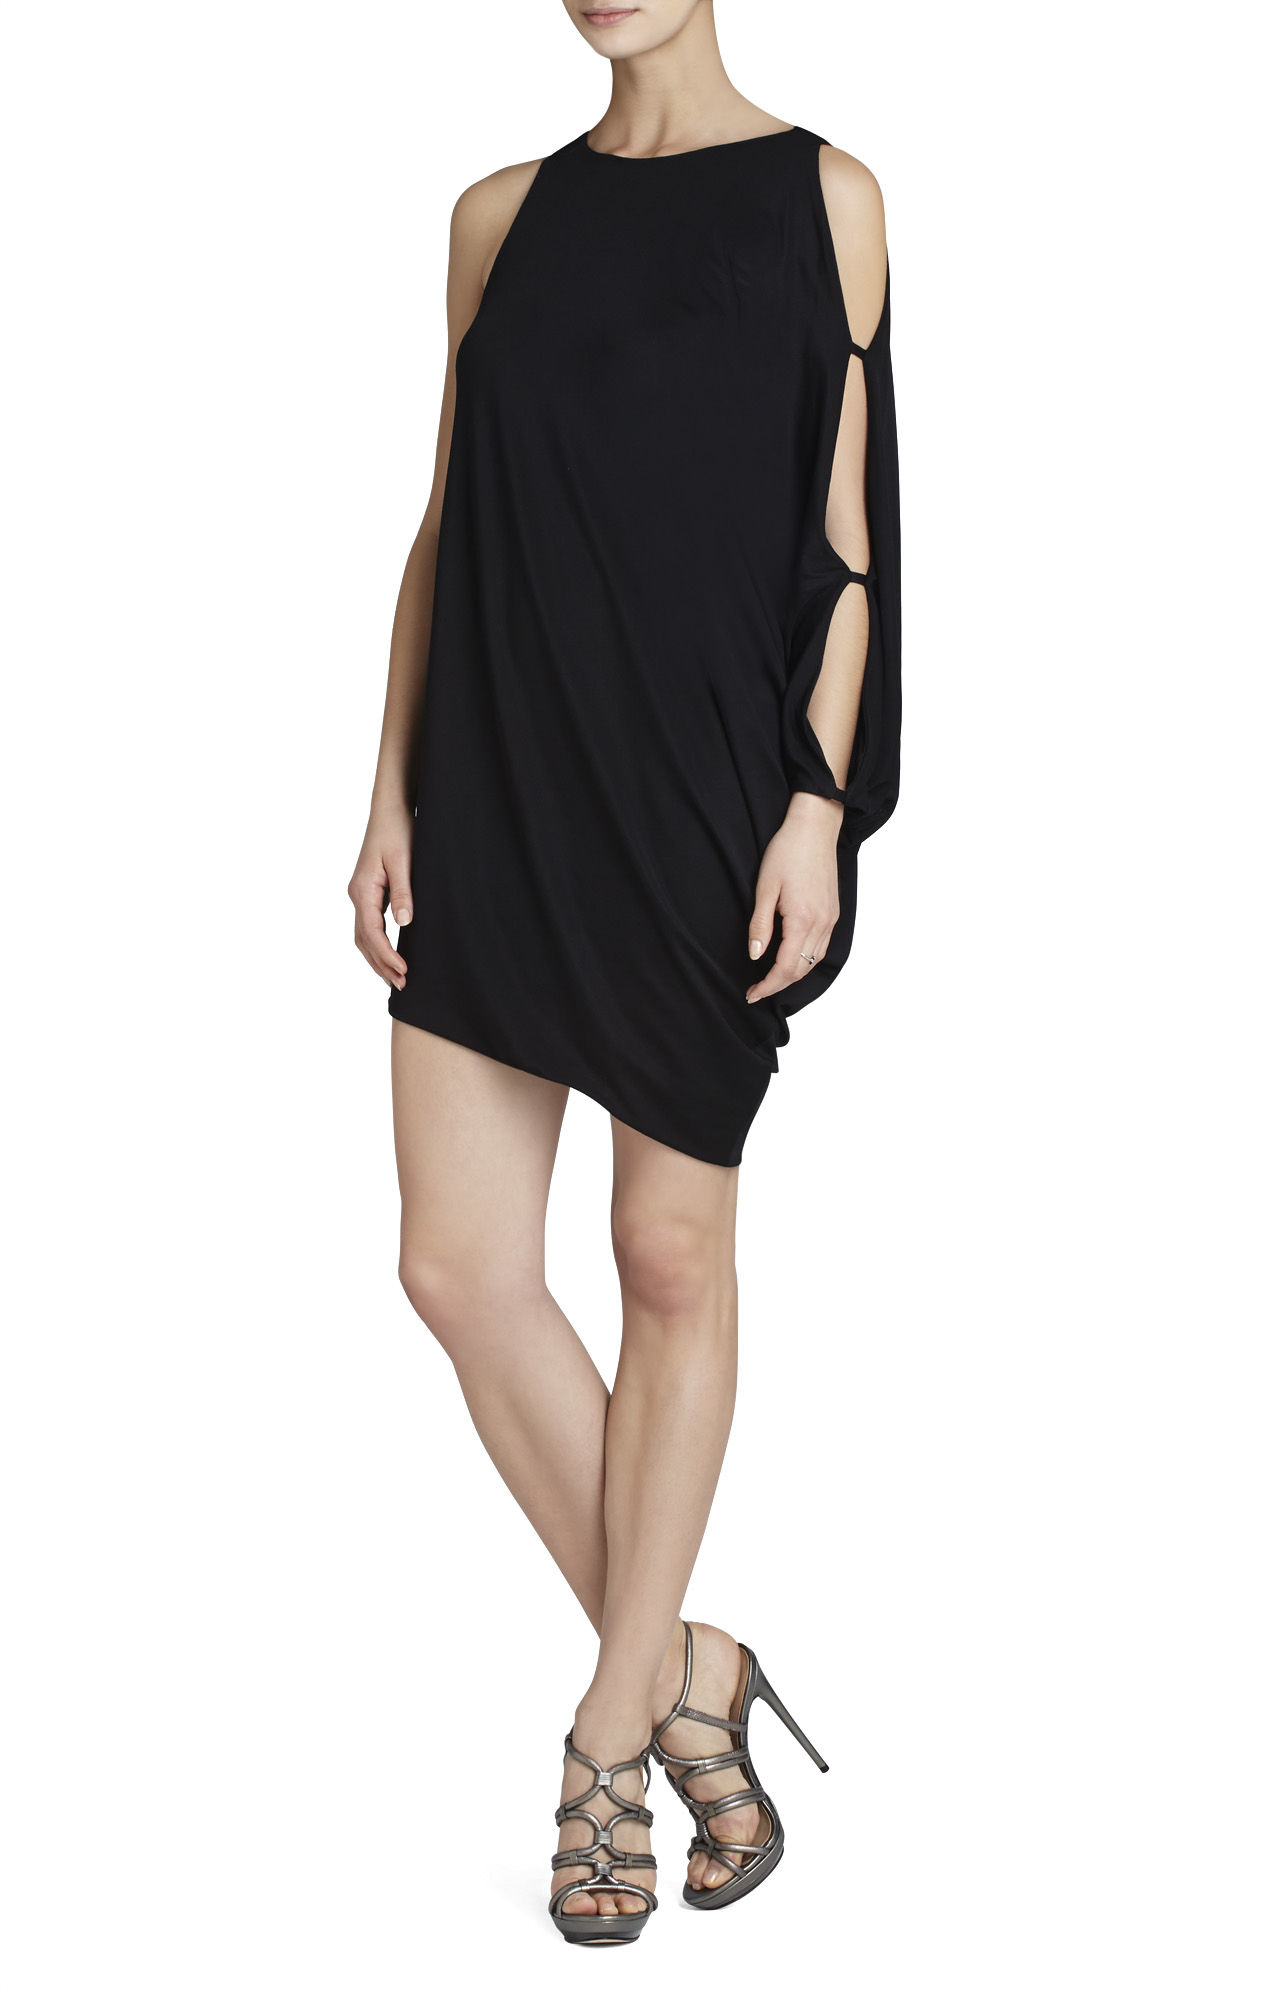 6802f2941f6046 Lyst - BCBGMAXAZRIA Farrow High-heel Strappy Dress Sandal in Gray